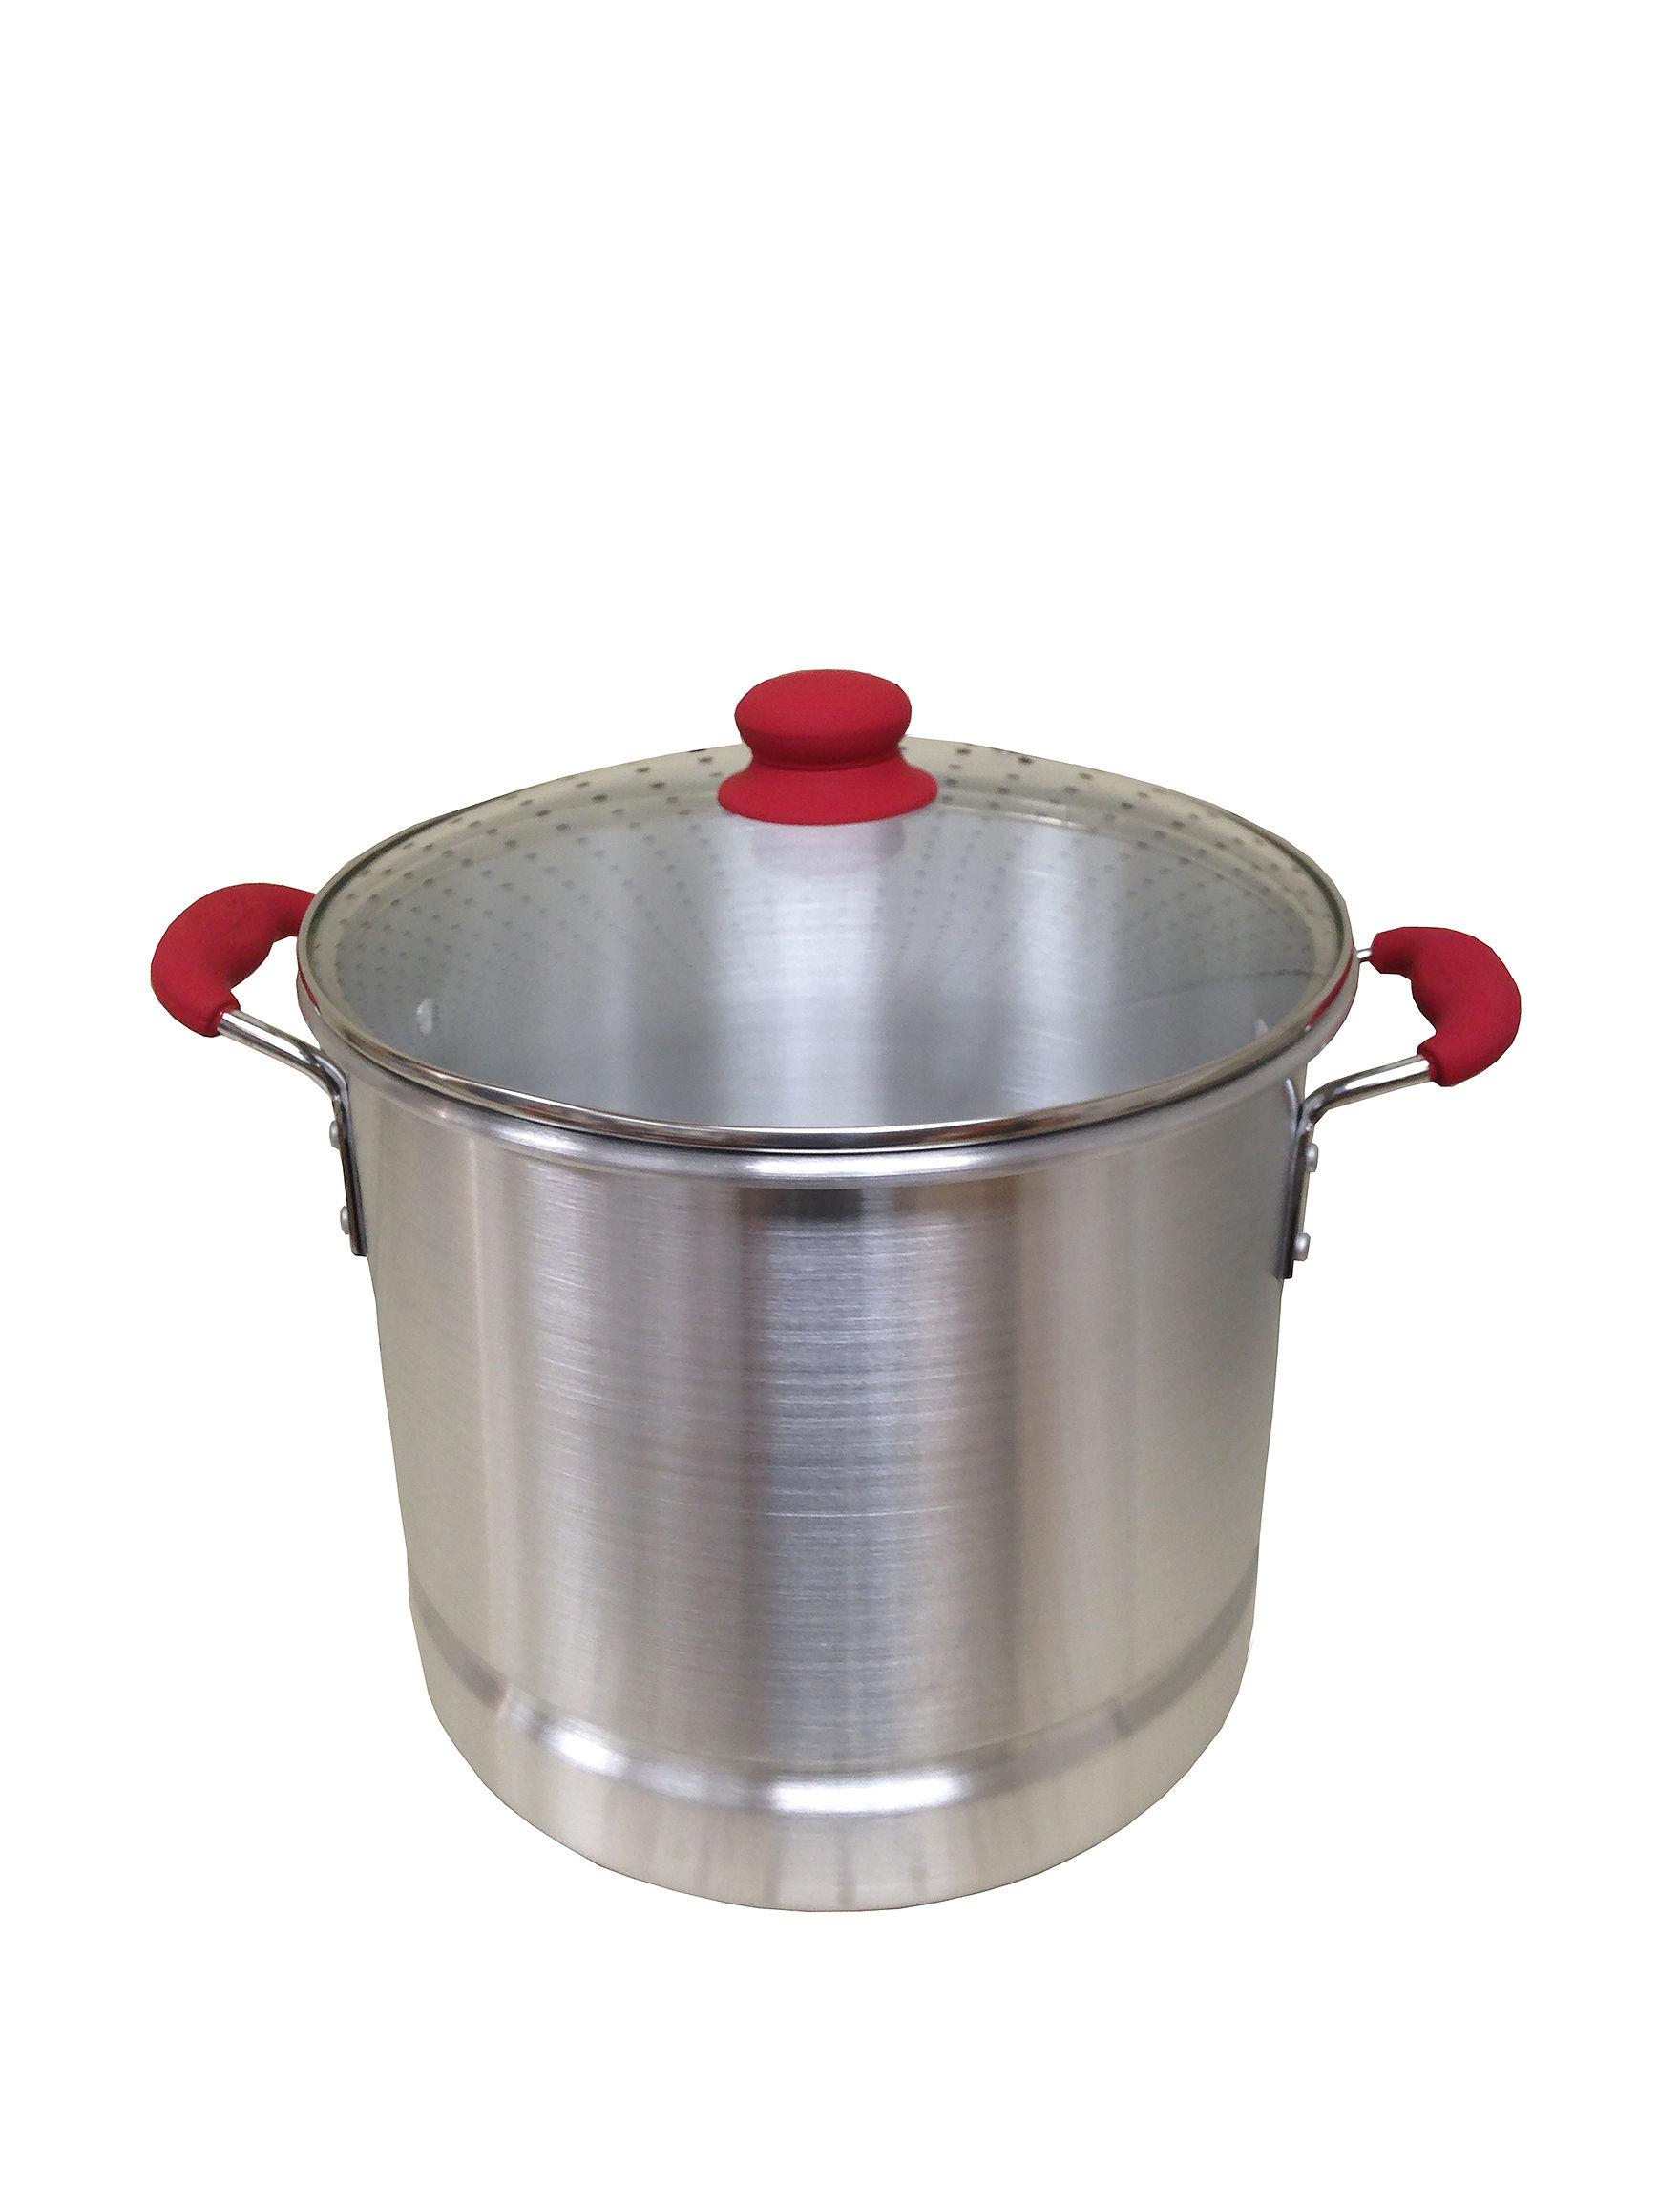 IMUSA Silver Pots & Dutch Ovens Cookware